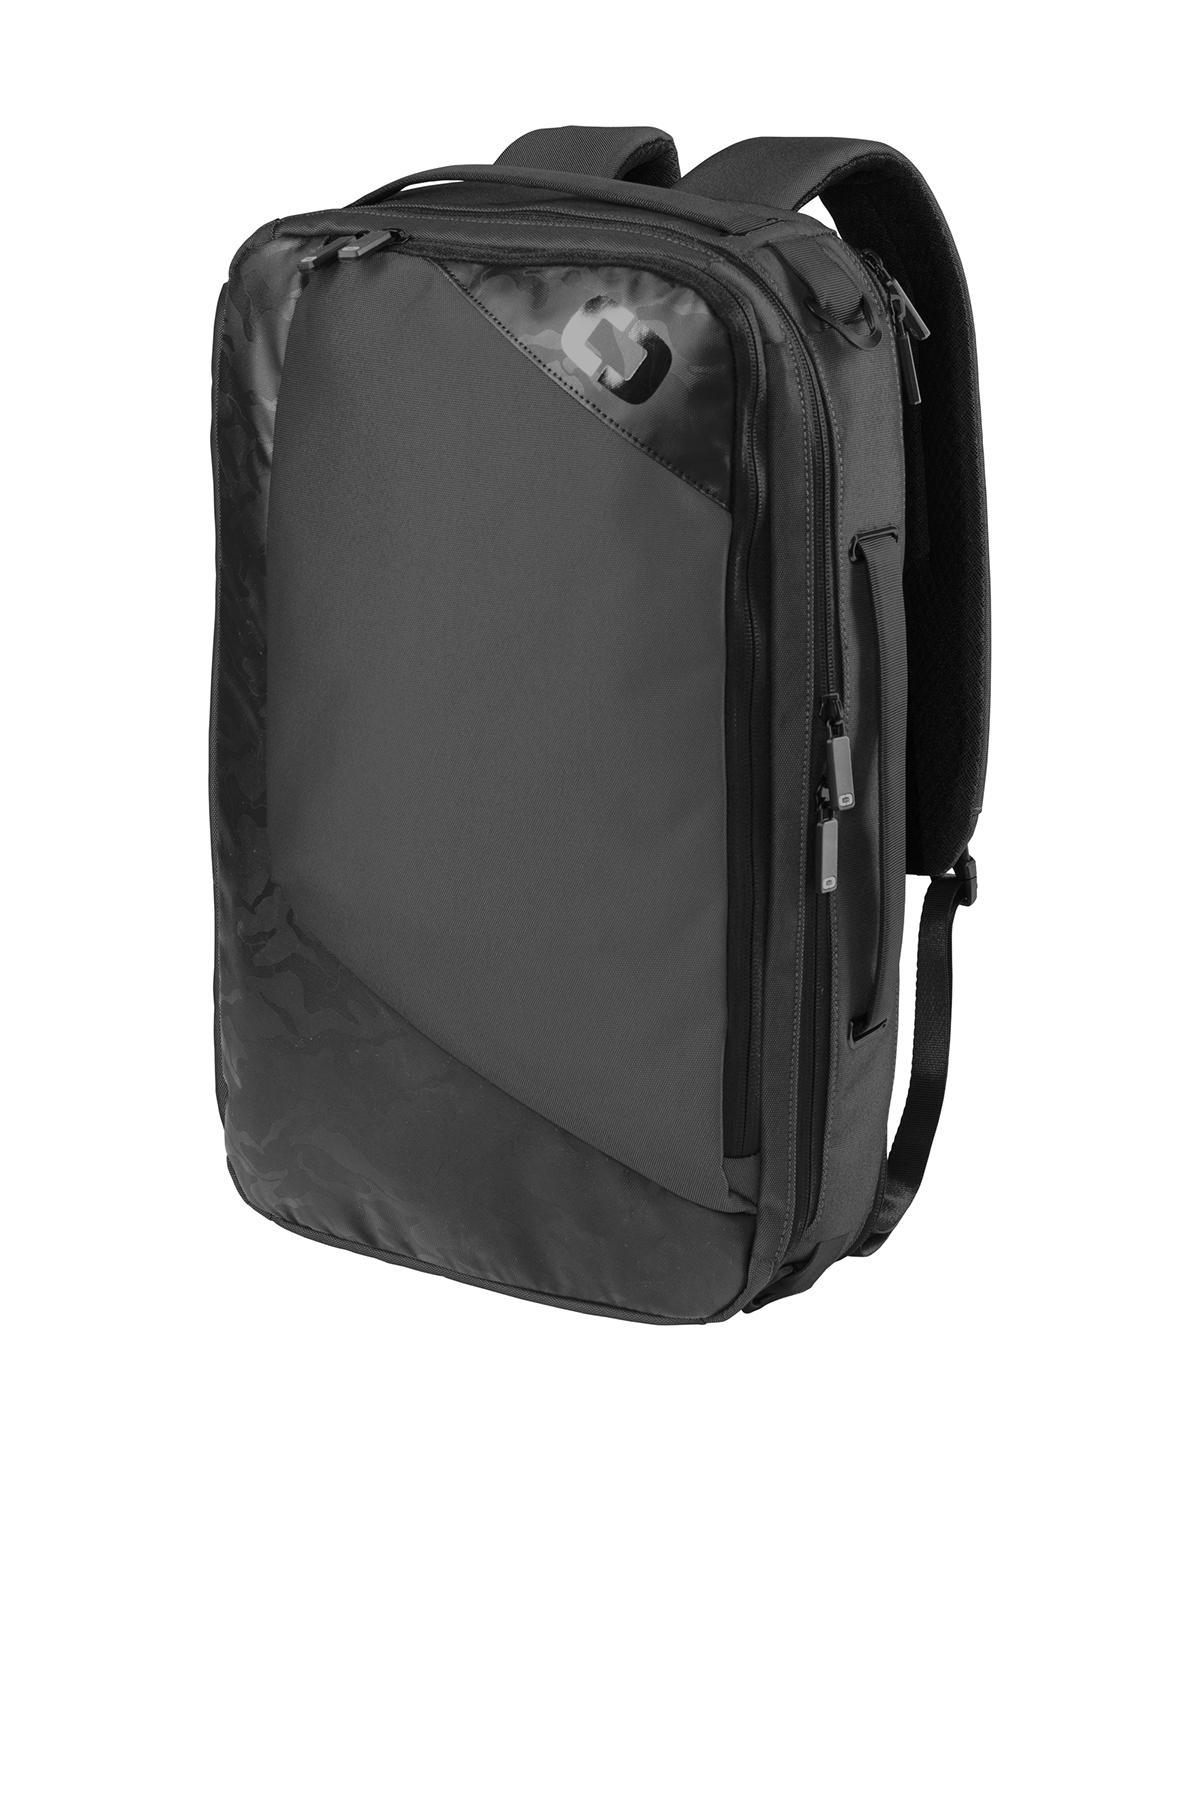 OGIO 91005 - Convert Pack